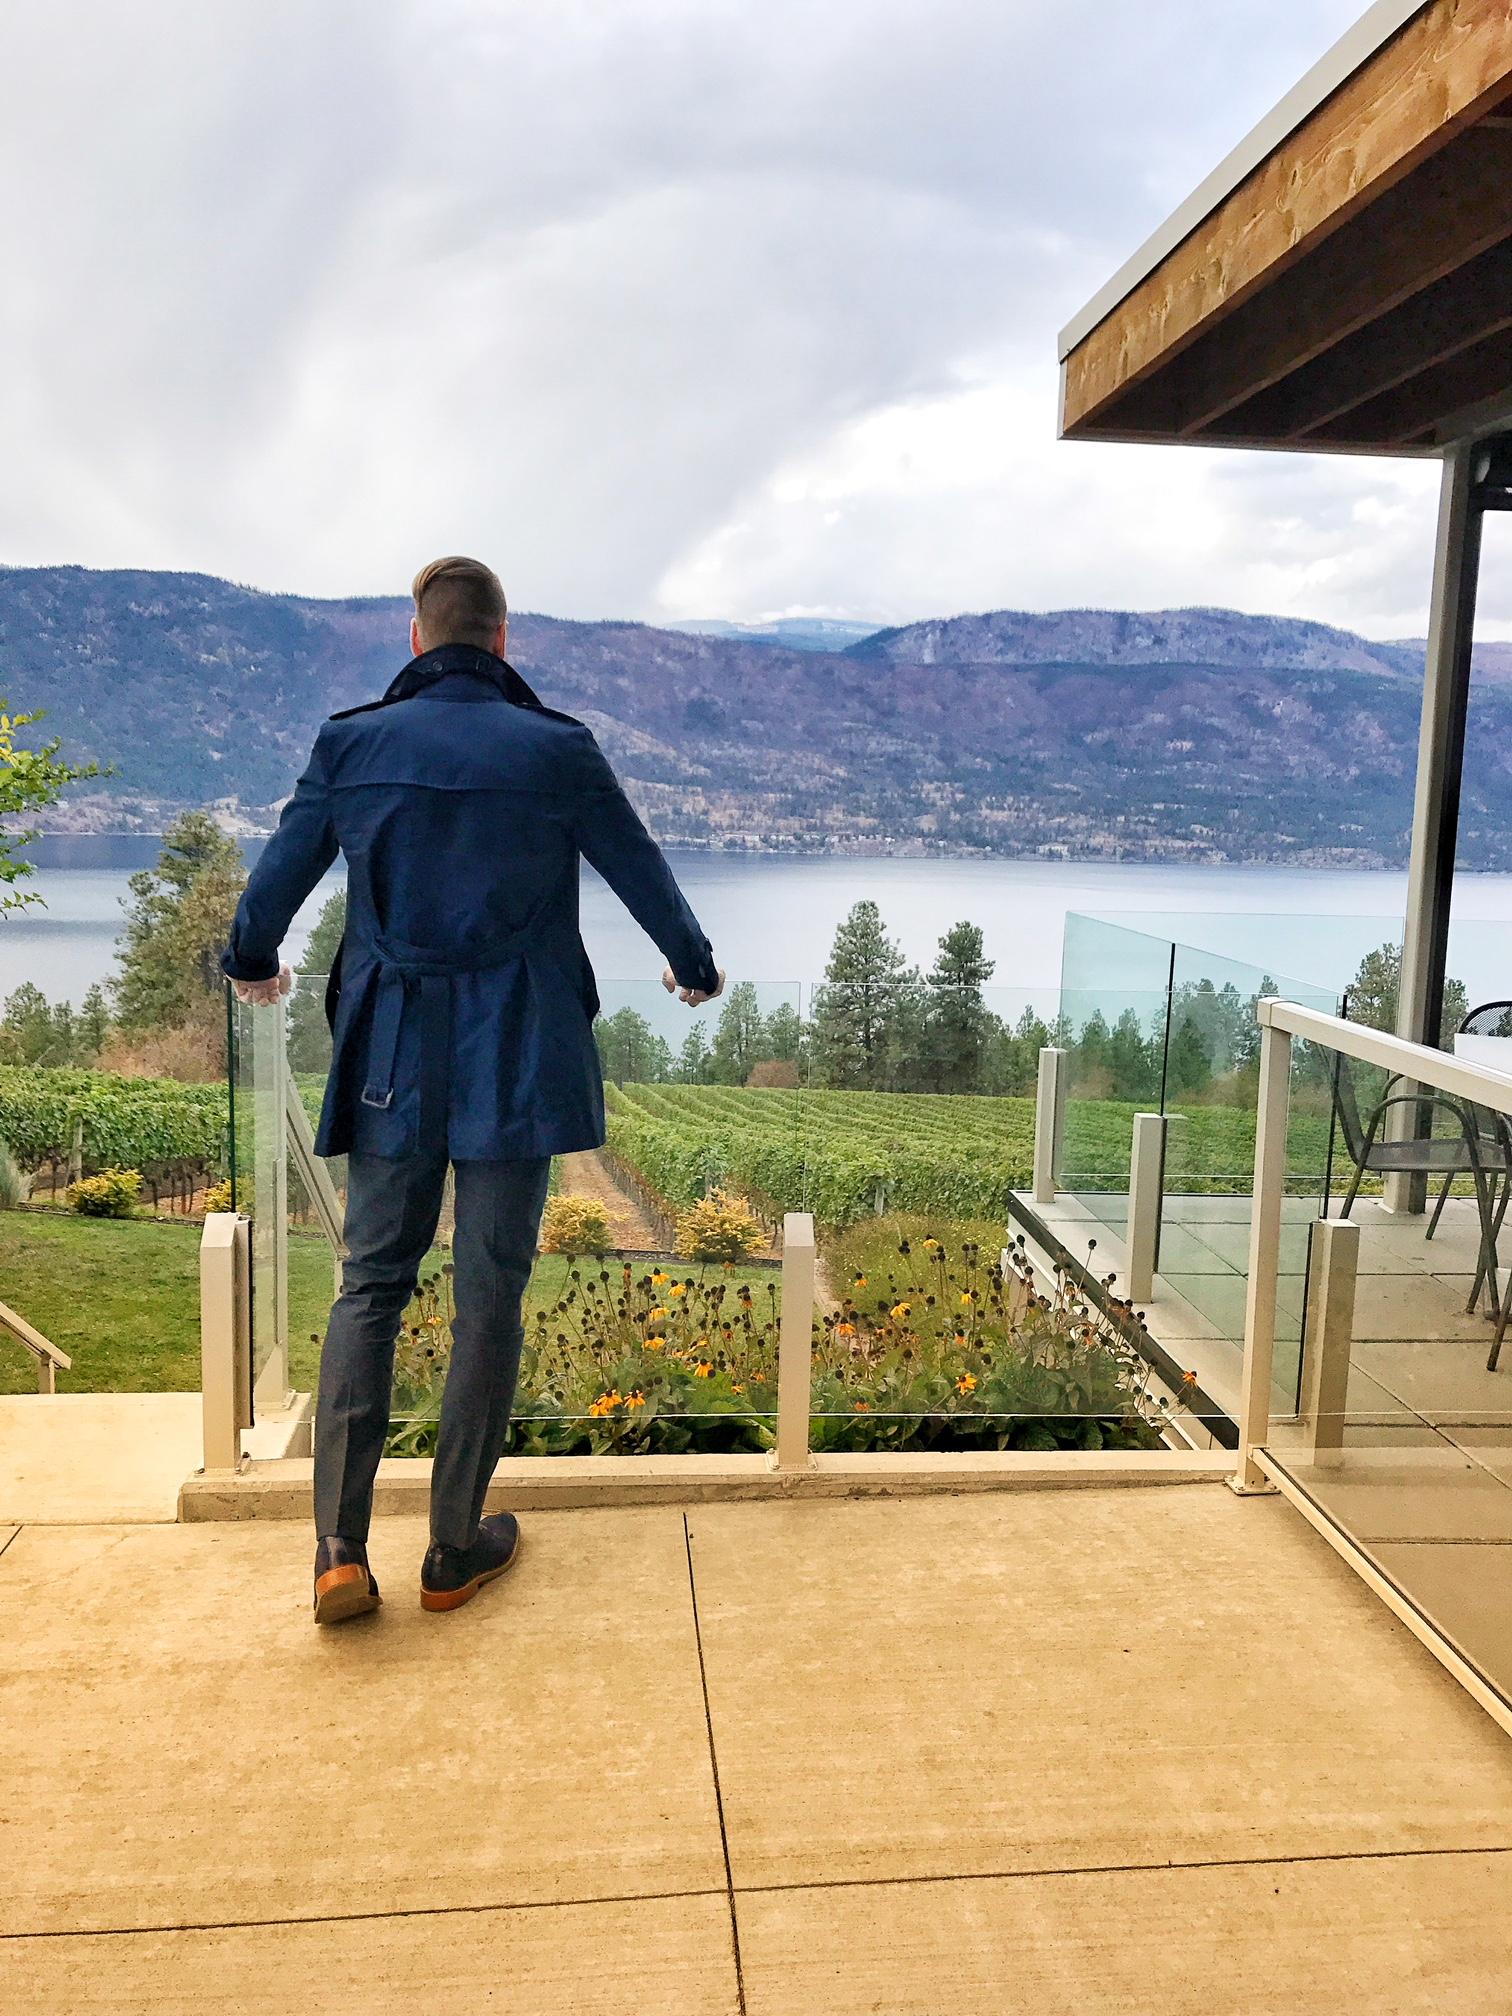 Enjoying the beauty of BC's Lake Country wine region.